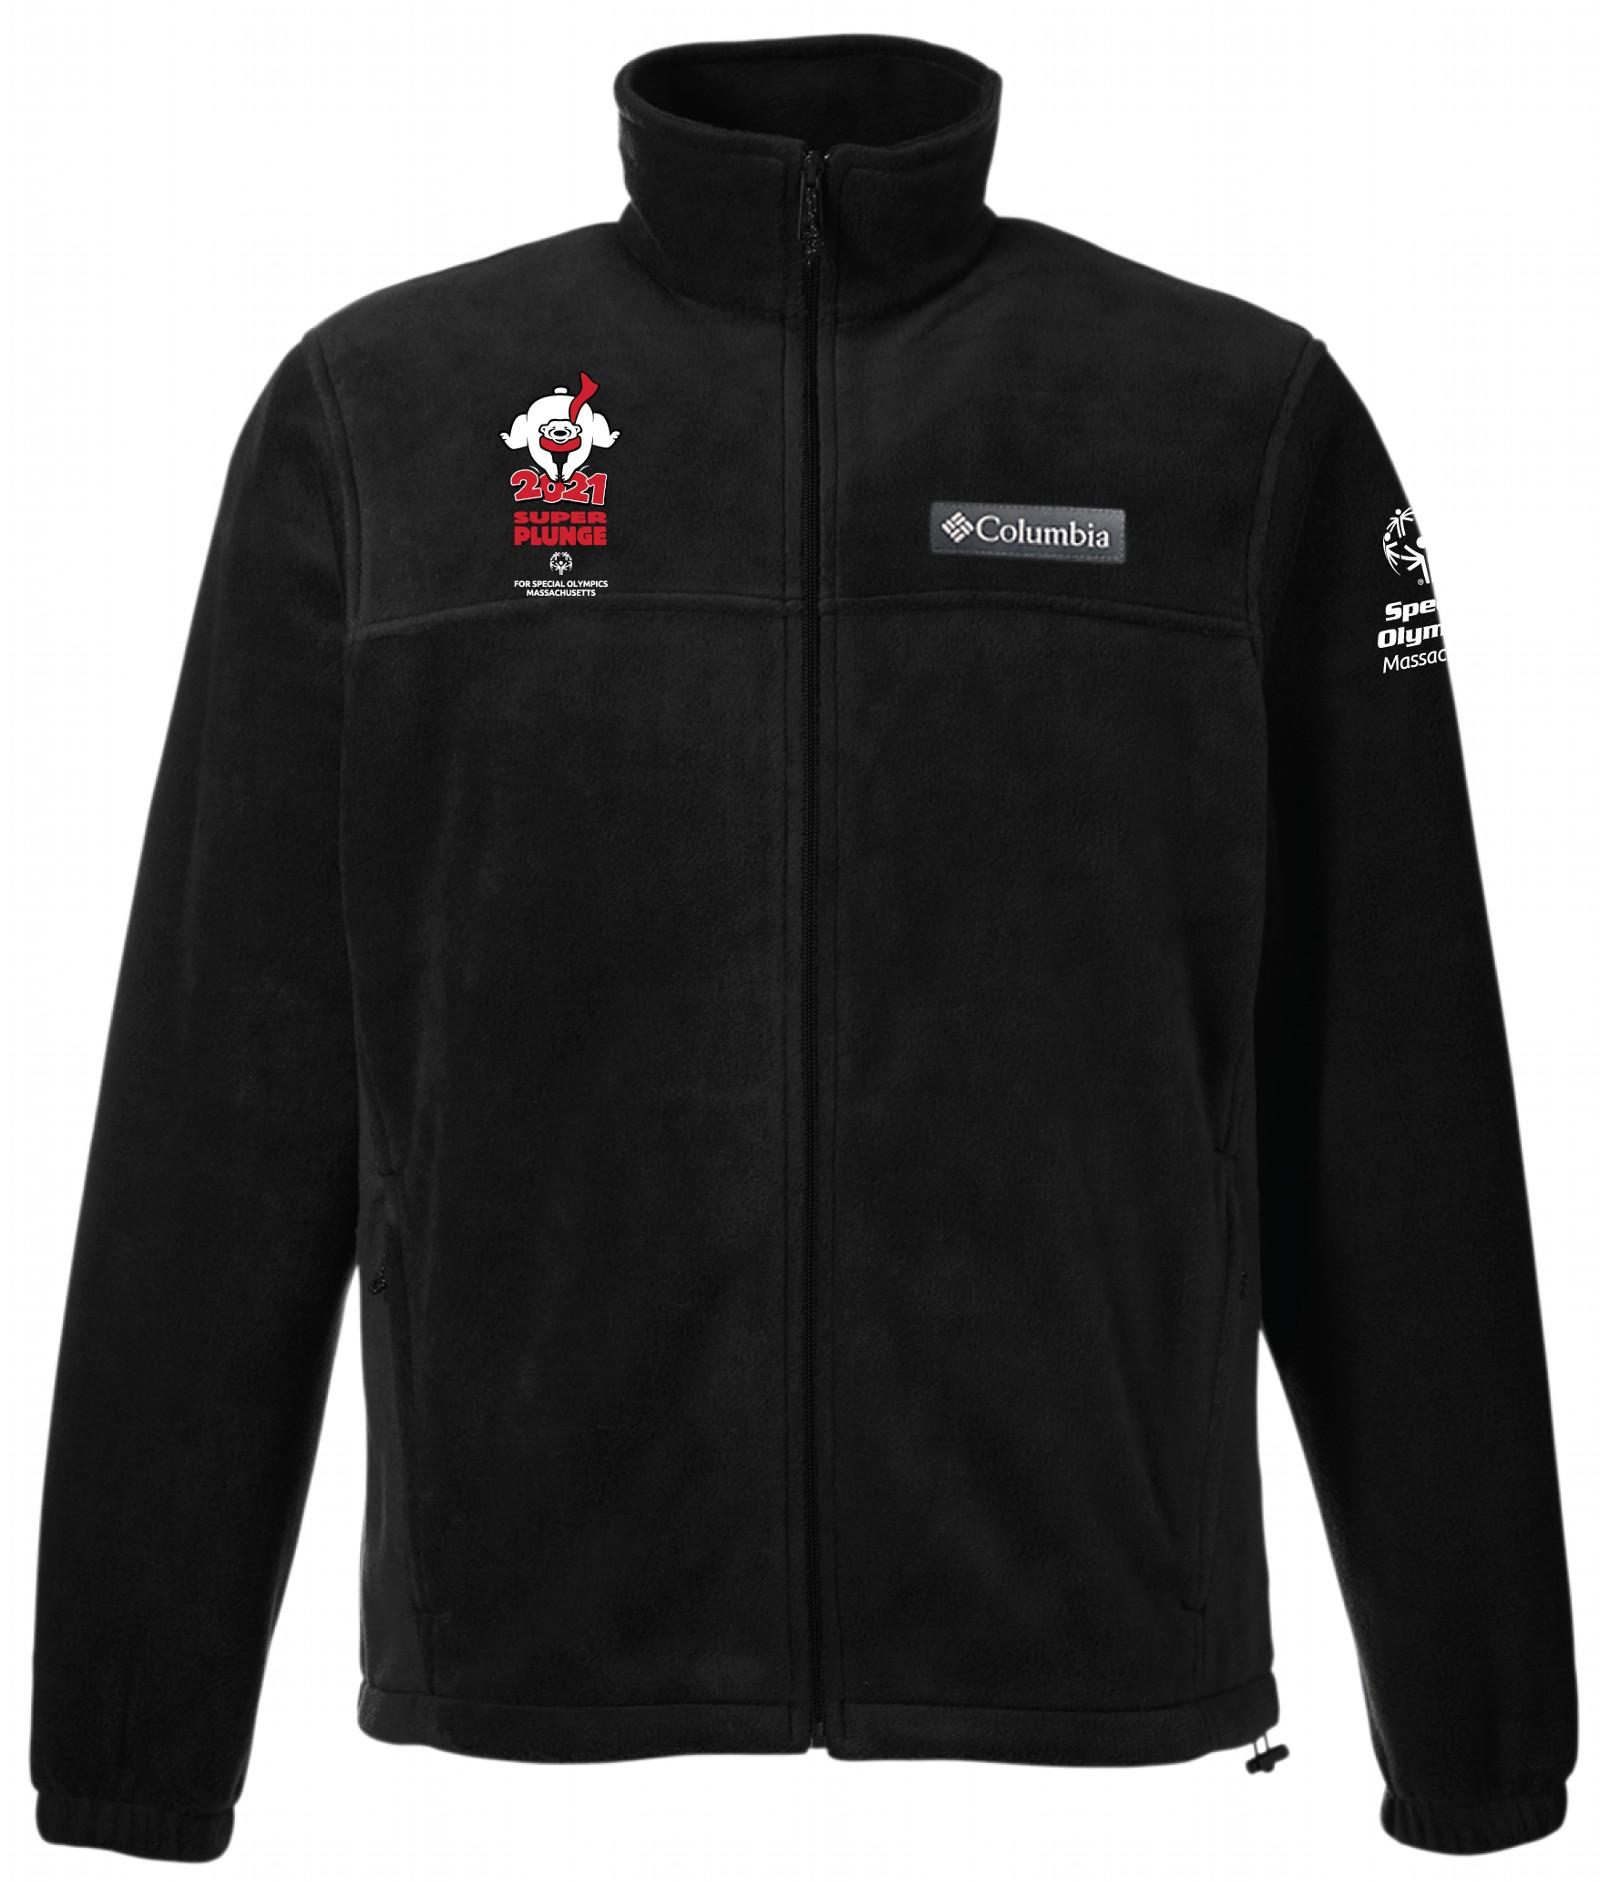 Columbia Black Jacket with SOMA and Plunge logo